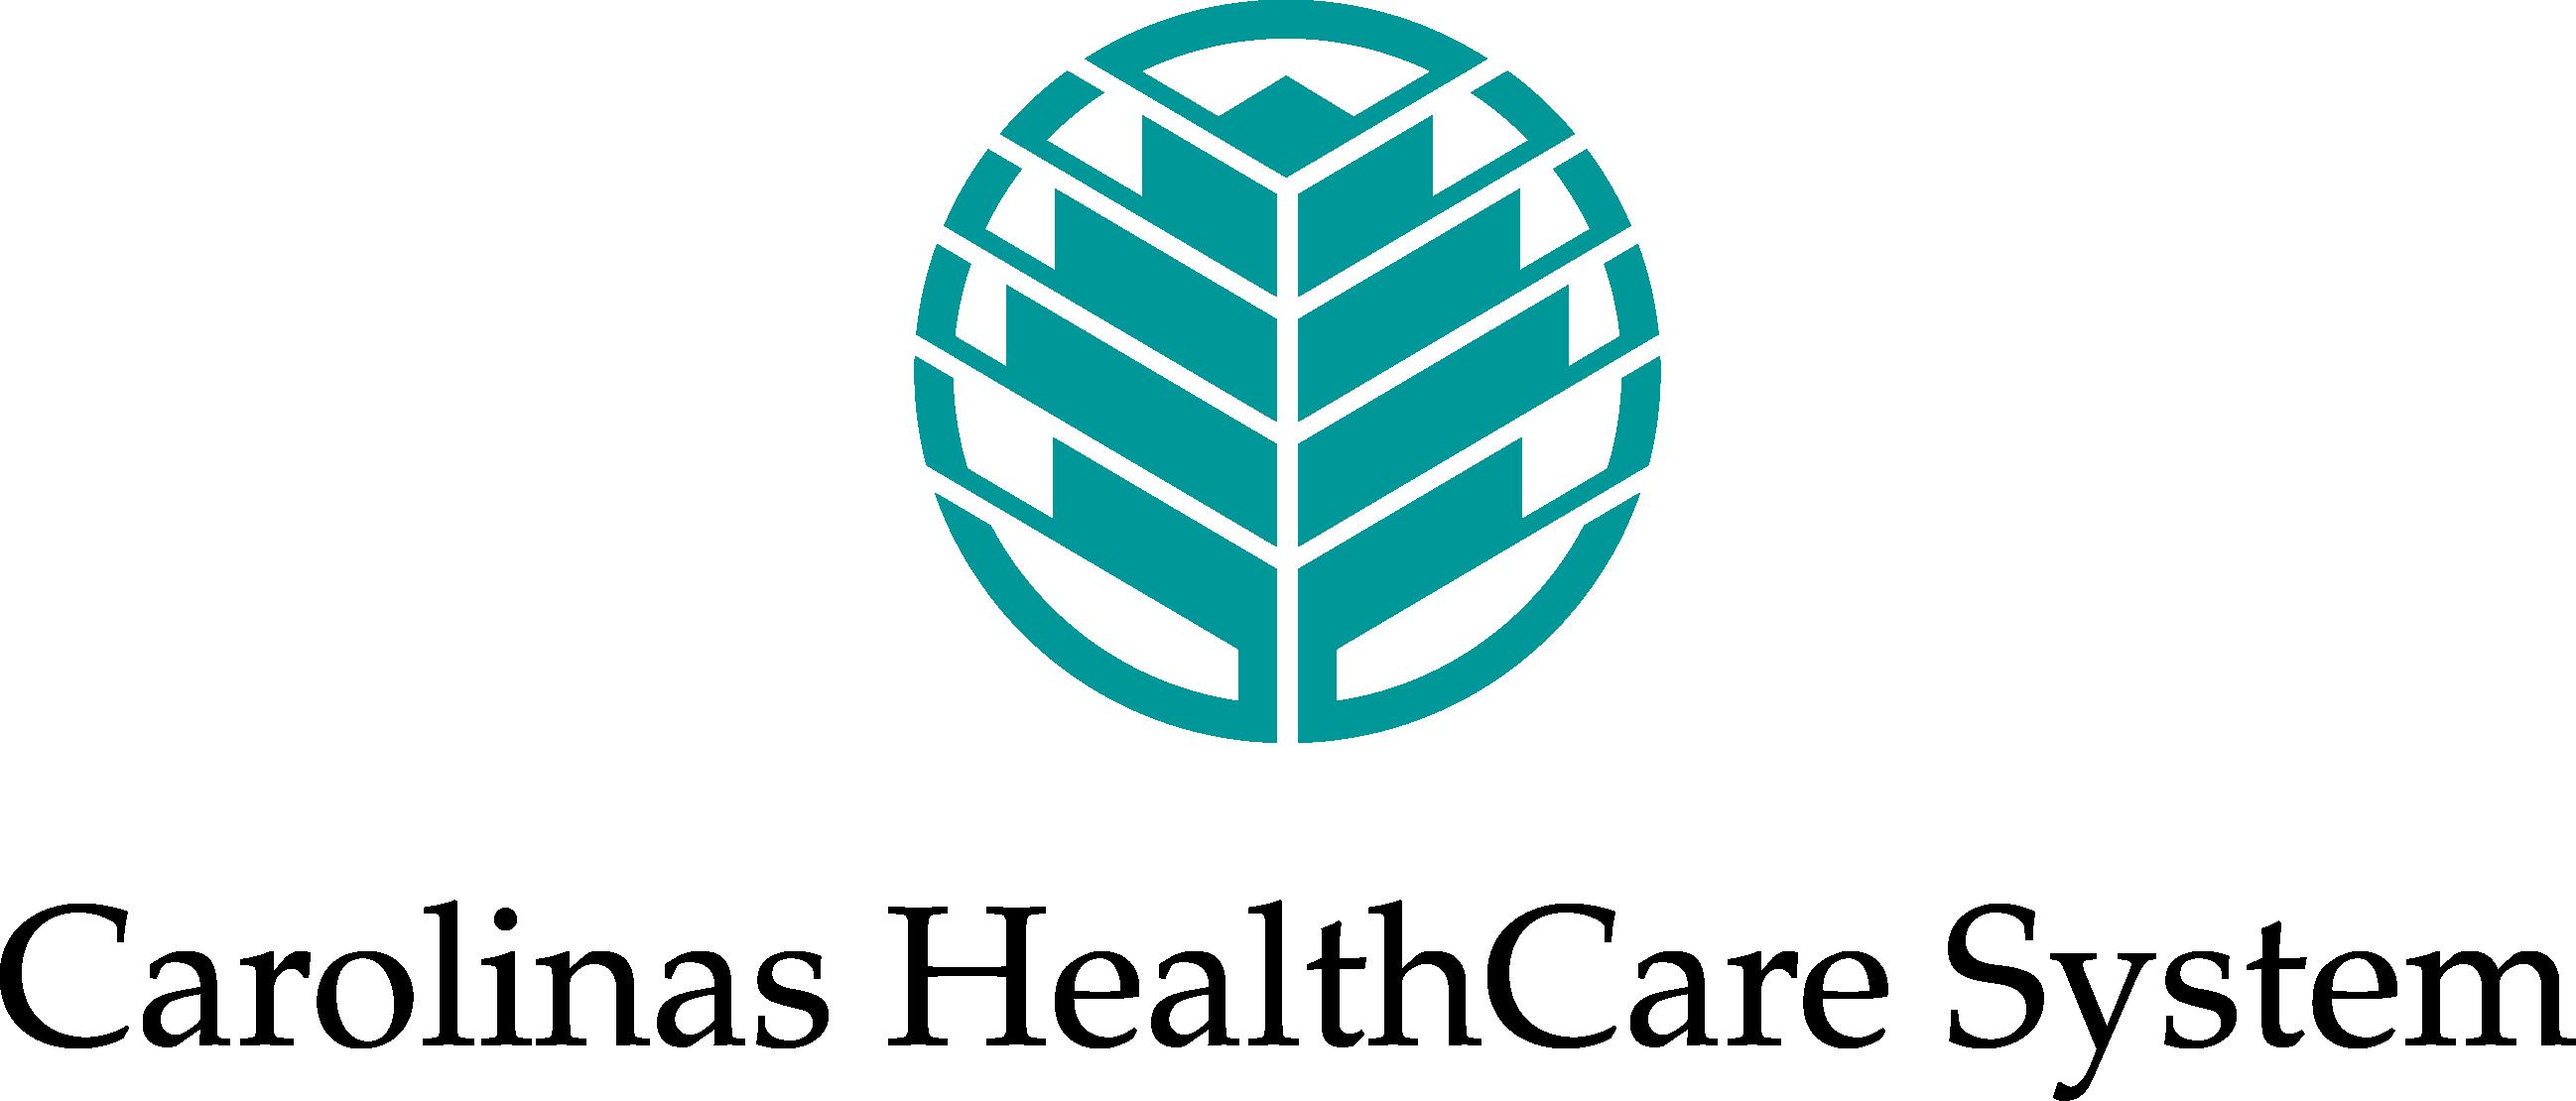 CHS-Vertical-Logo-4C.png